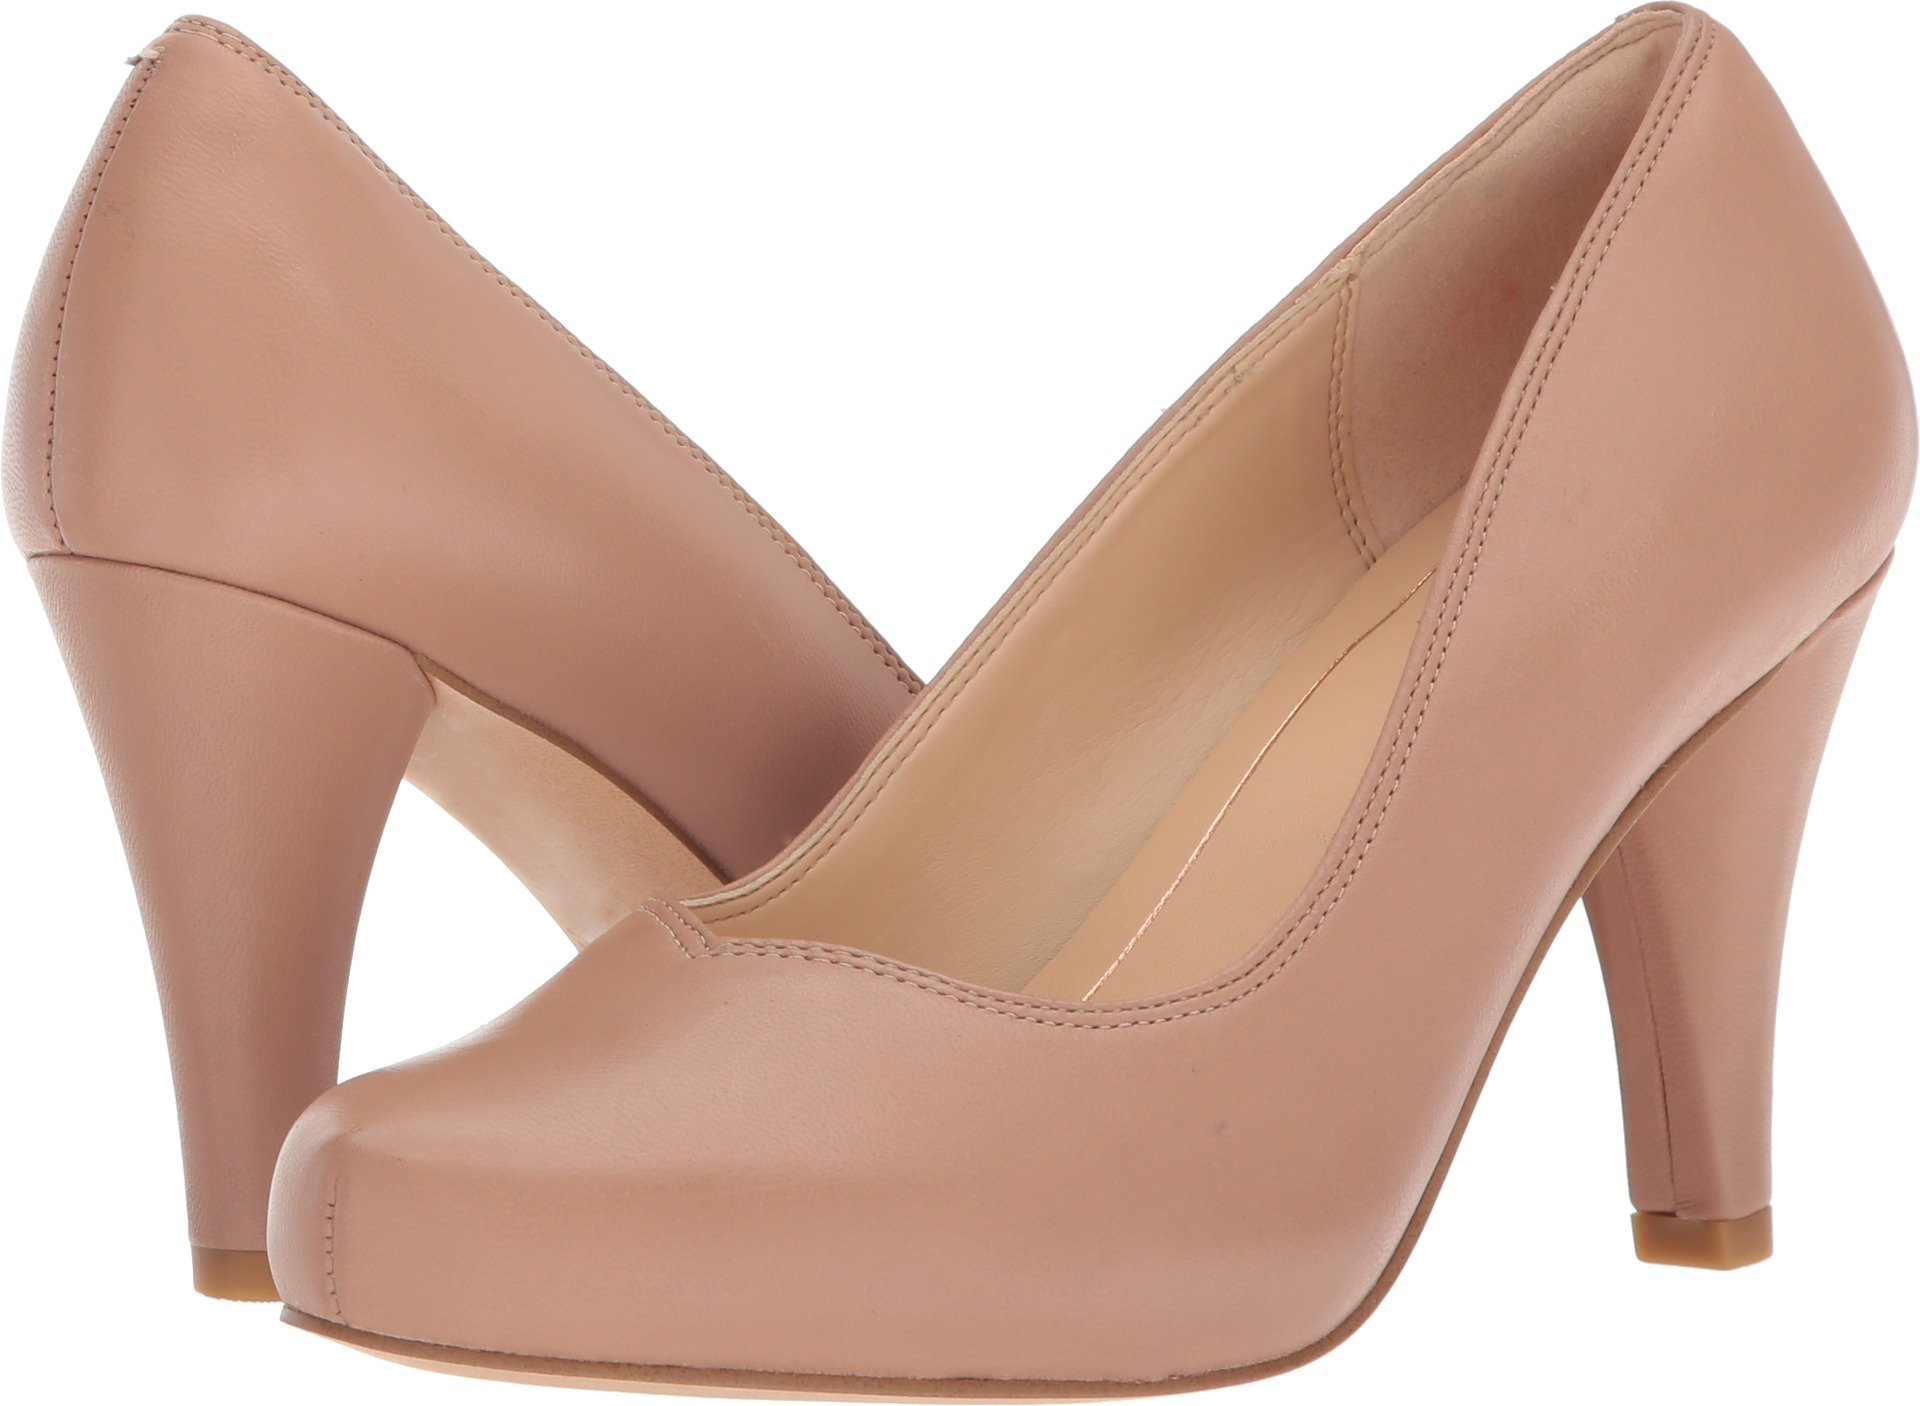 CLARKS Women's Dalia Rose Nude Leather 8.5 B US